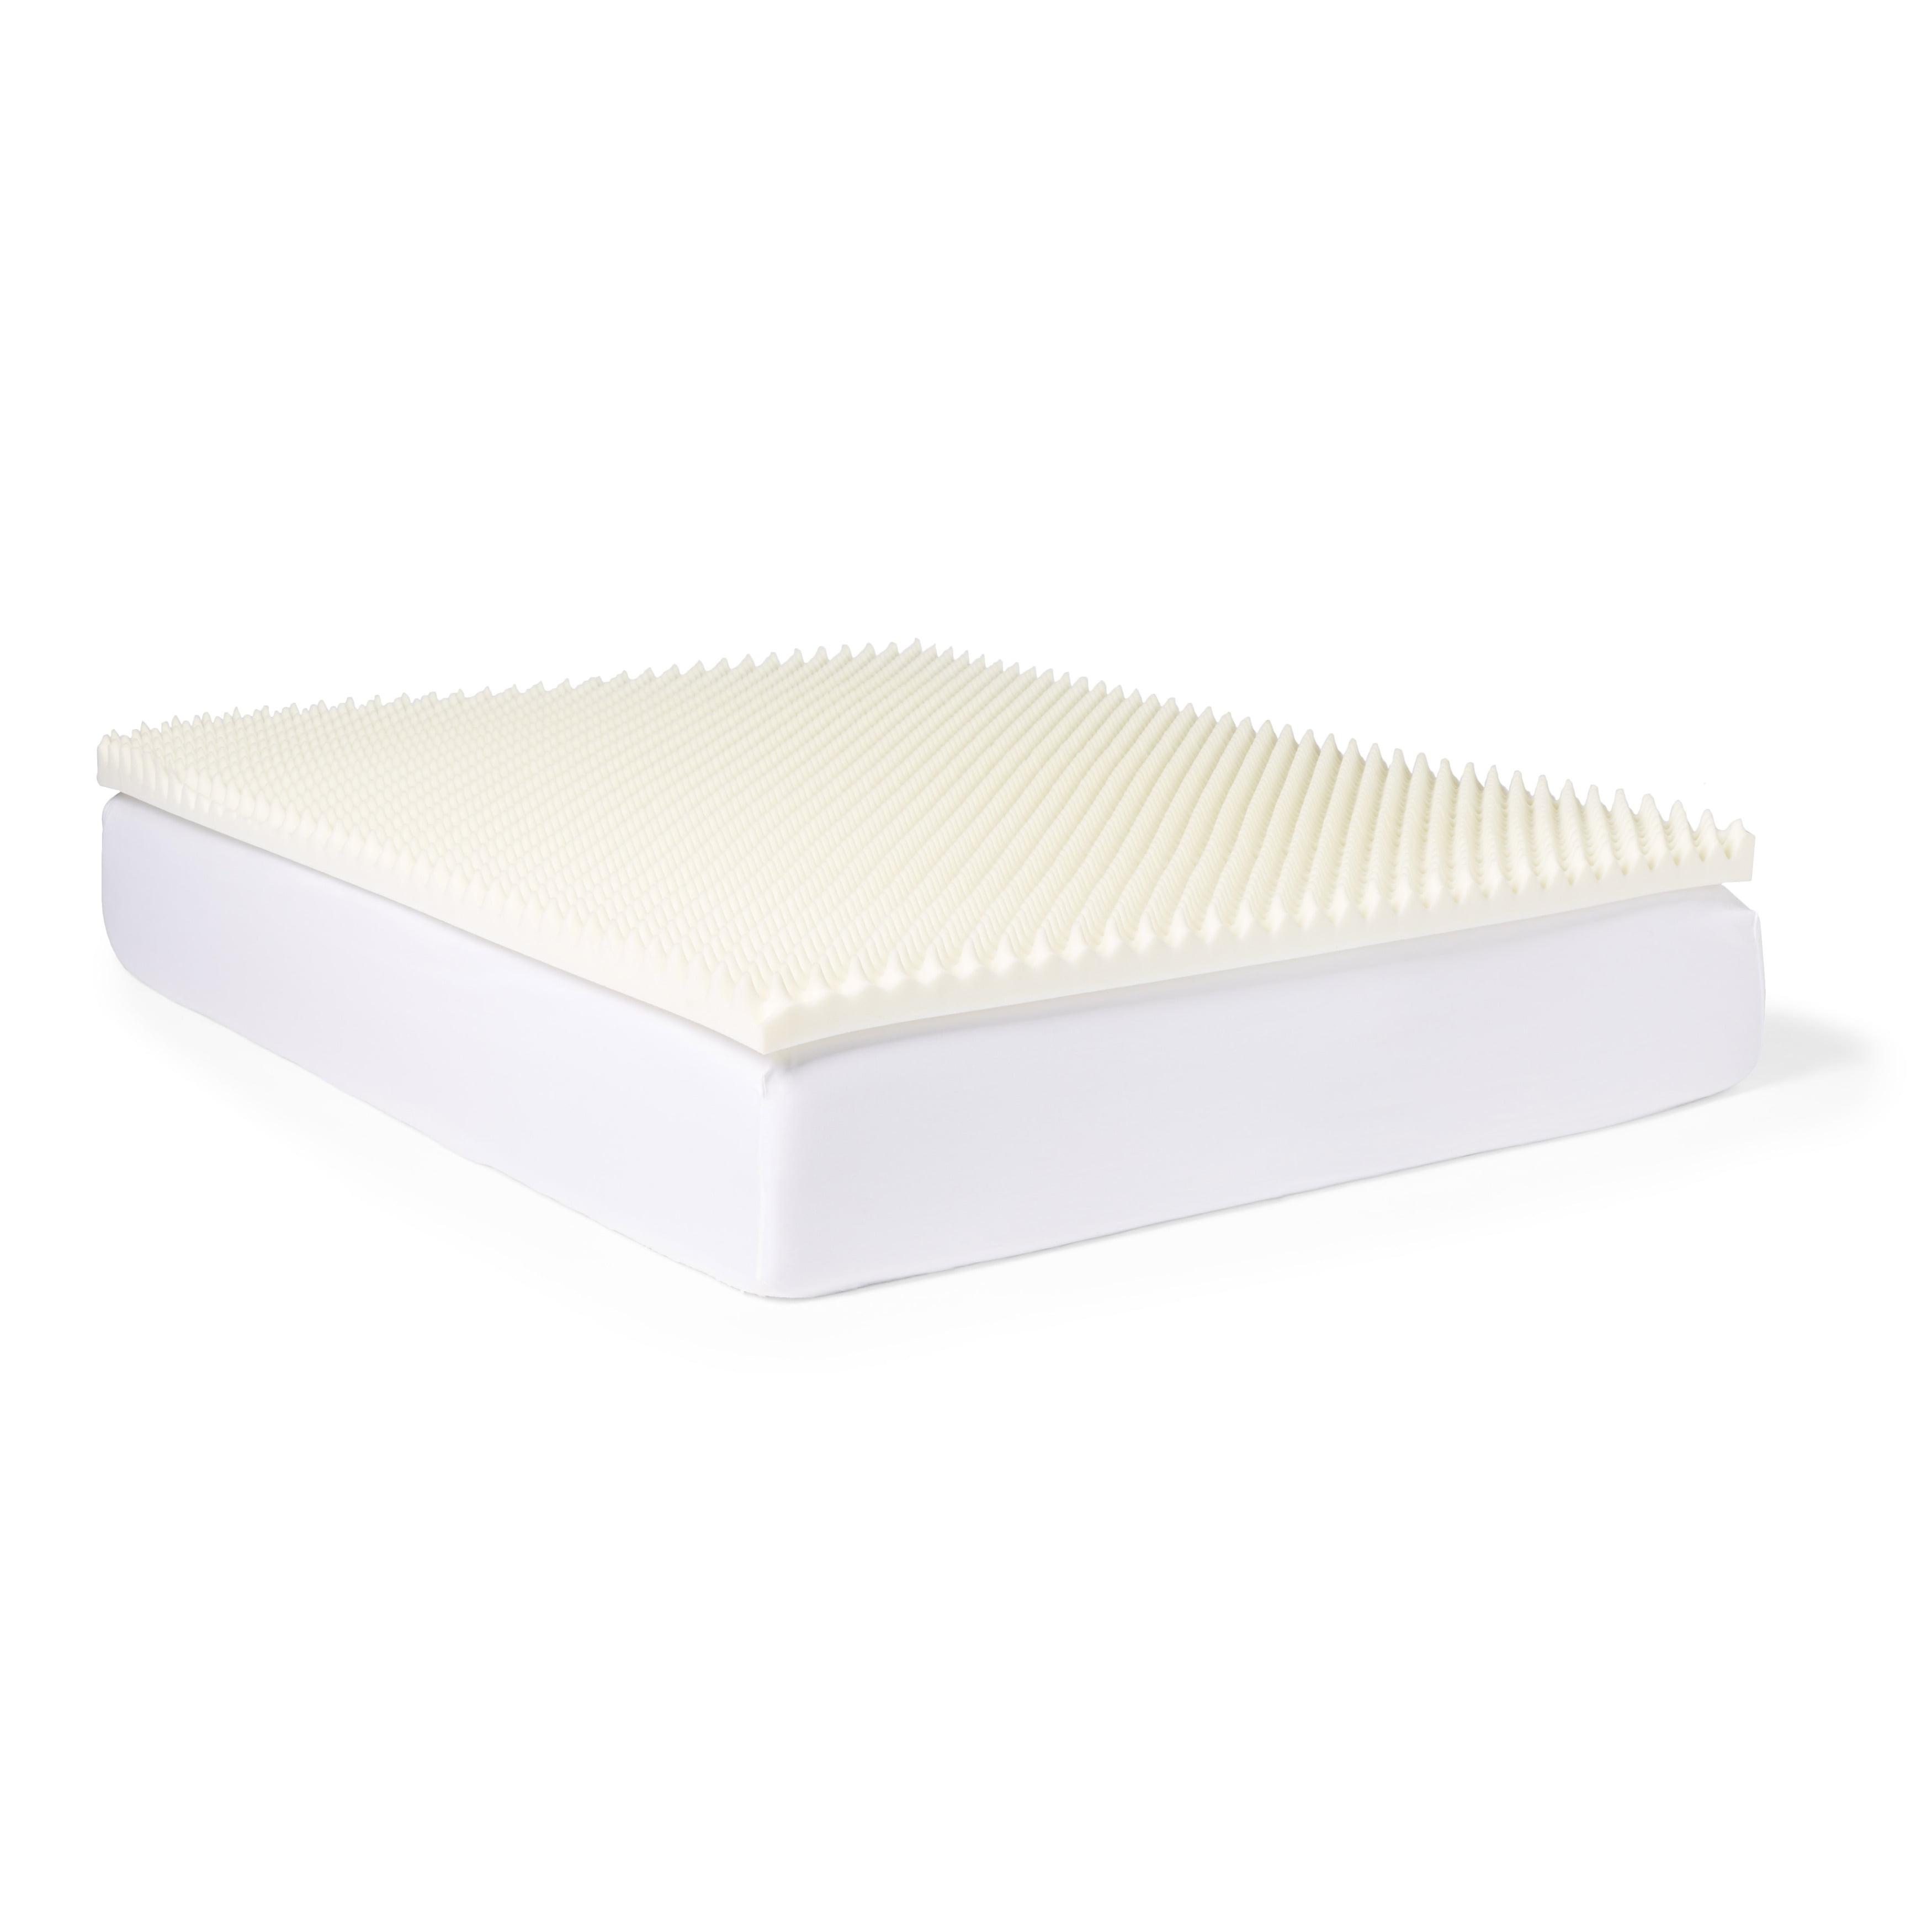 Slumber Solutions Highloft Supreme 3 Inch Memory Foam Mattress